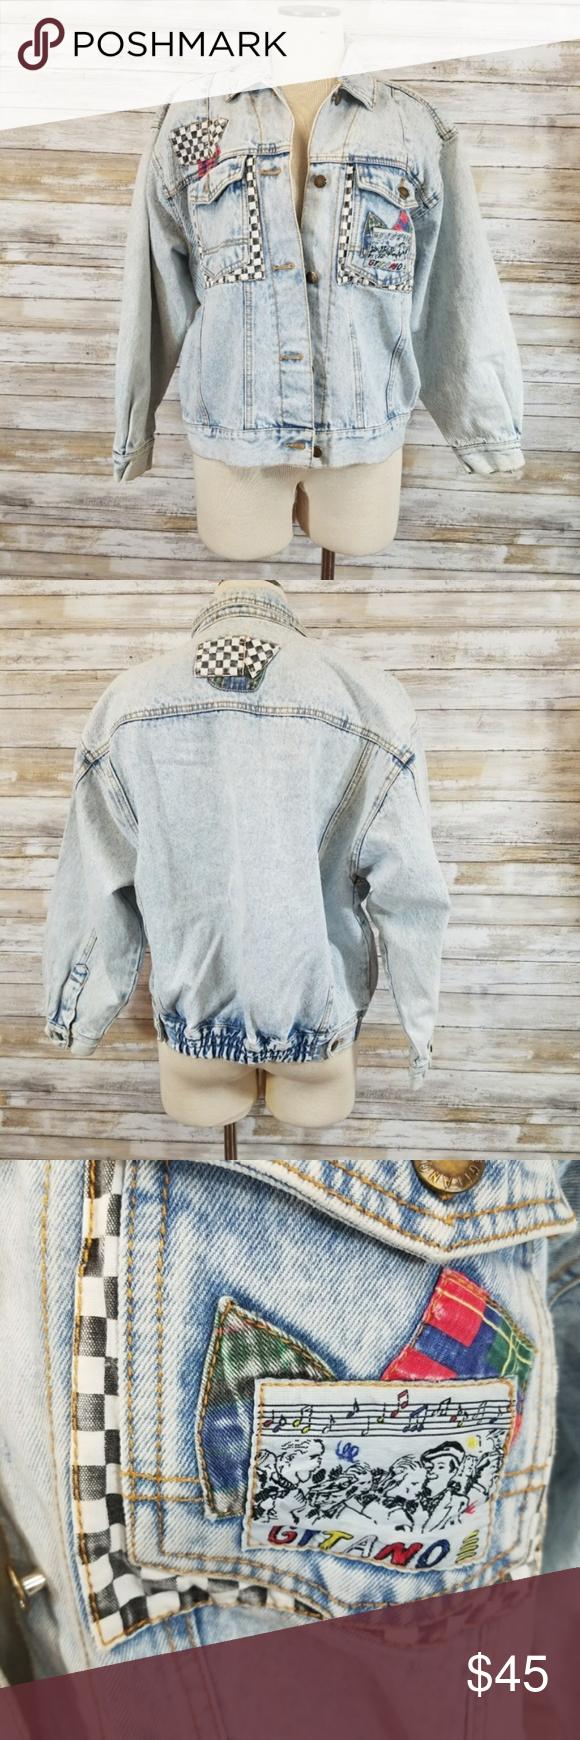 Vintage Gitano Jean Jacket W Checker Patches Amazingly Rad Vintage Gitano Denim Jacket With Classic Checkere Vintage Jean Jacket Vintage Jacket Clothes Design [ 1740 x 580 Pixel ]